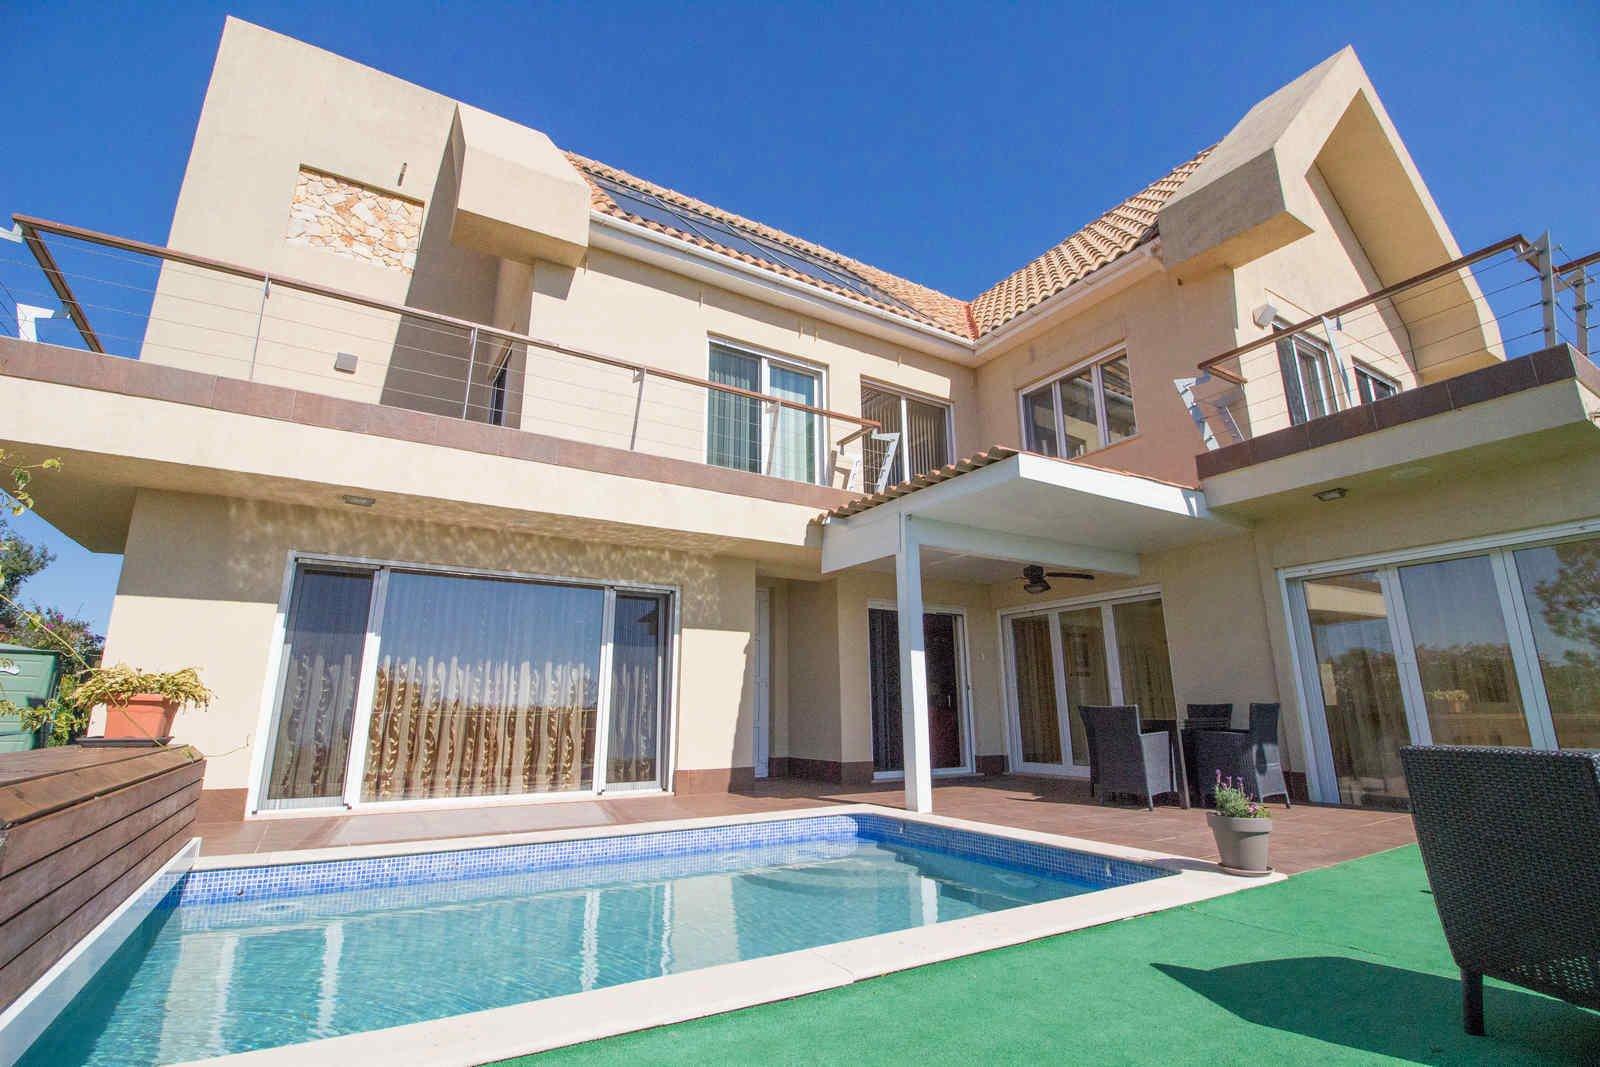 3 Bedroom Villa Almancil, Central Algarve Ref: PV3447